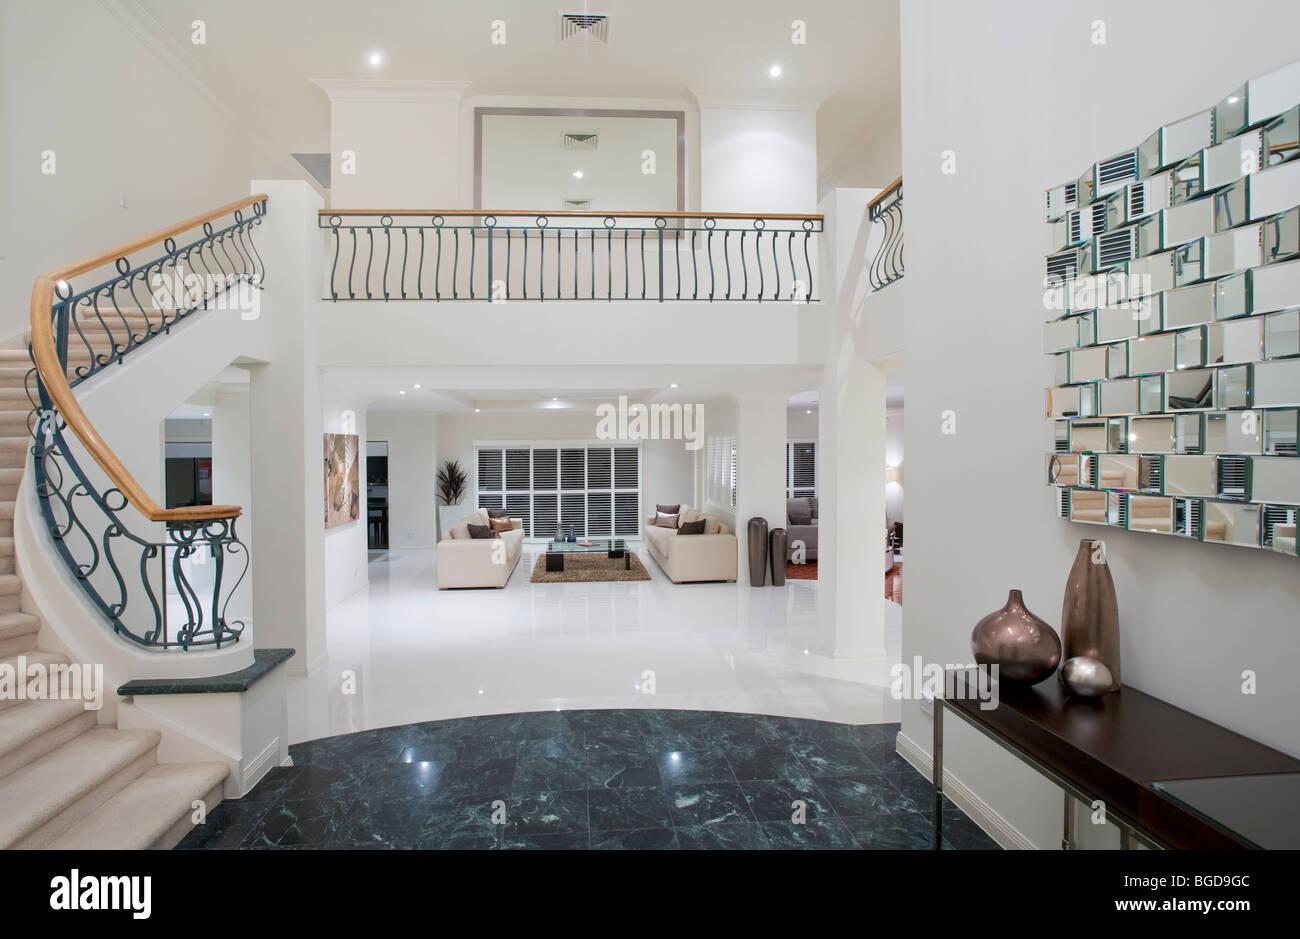 luxus villa eingang mit marmorboden stockfoto bild. Black Bedroom Furniture Sets. Home Design Ideas